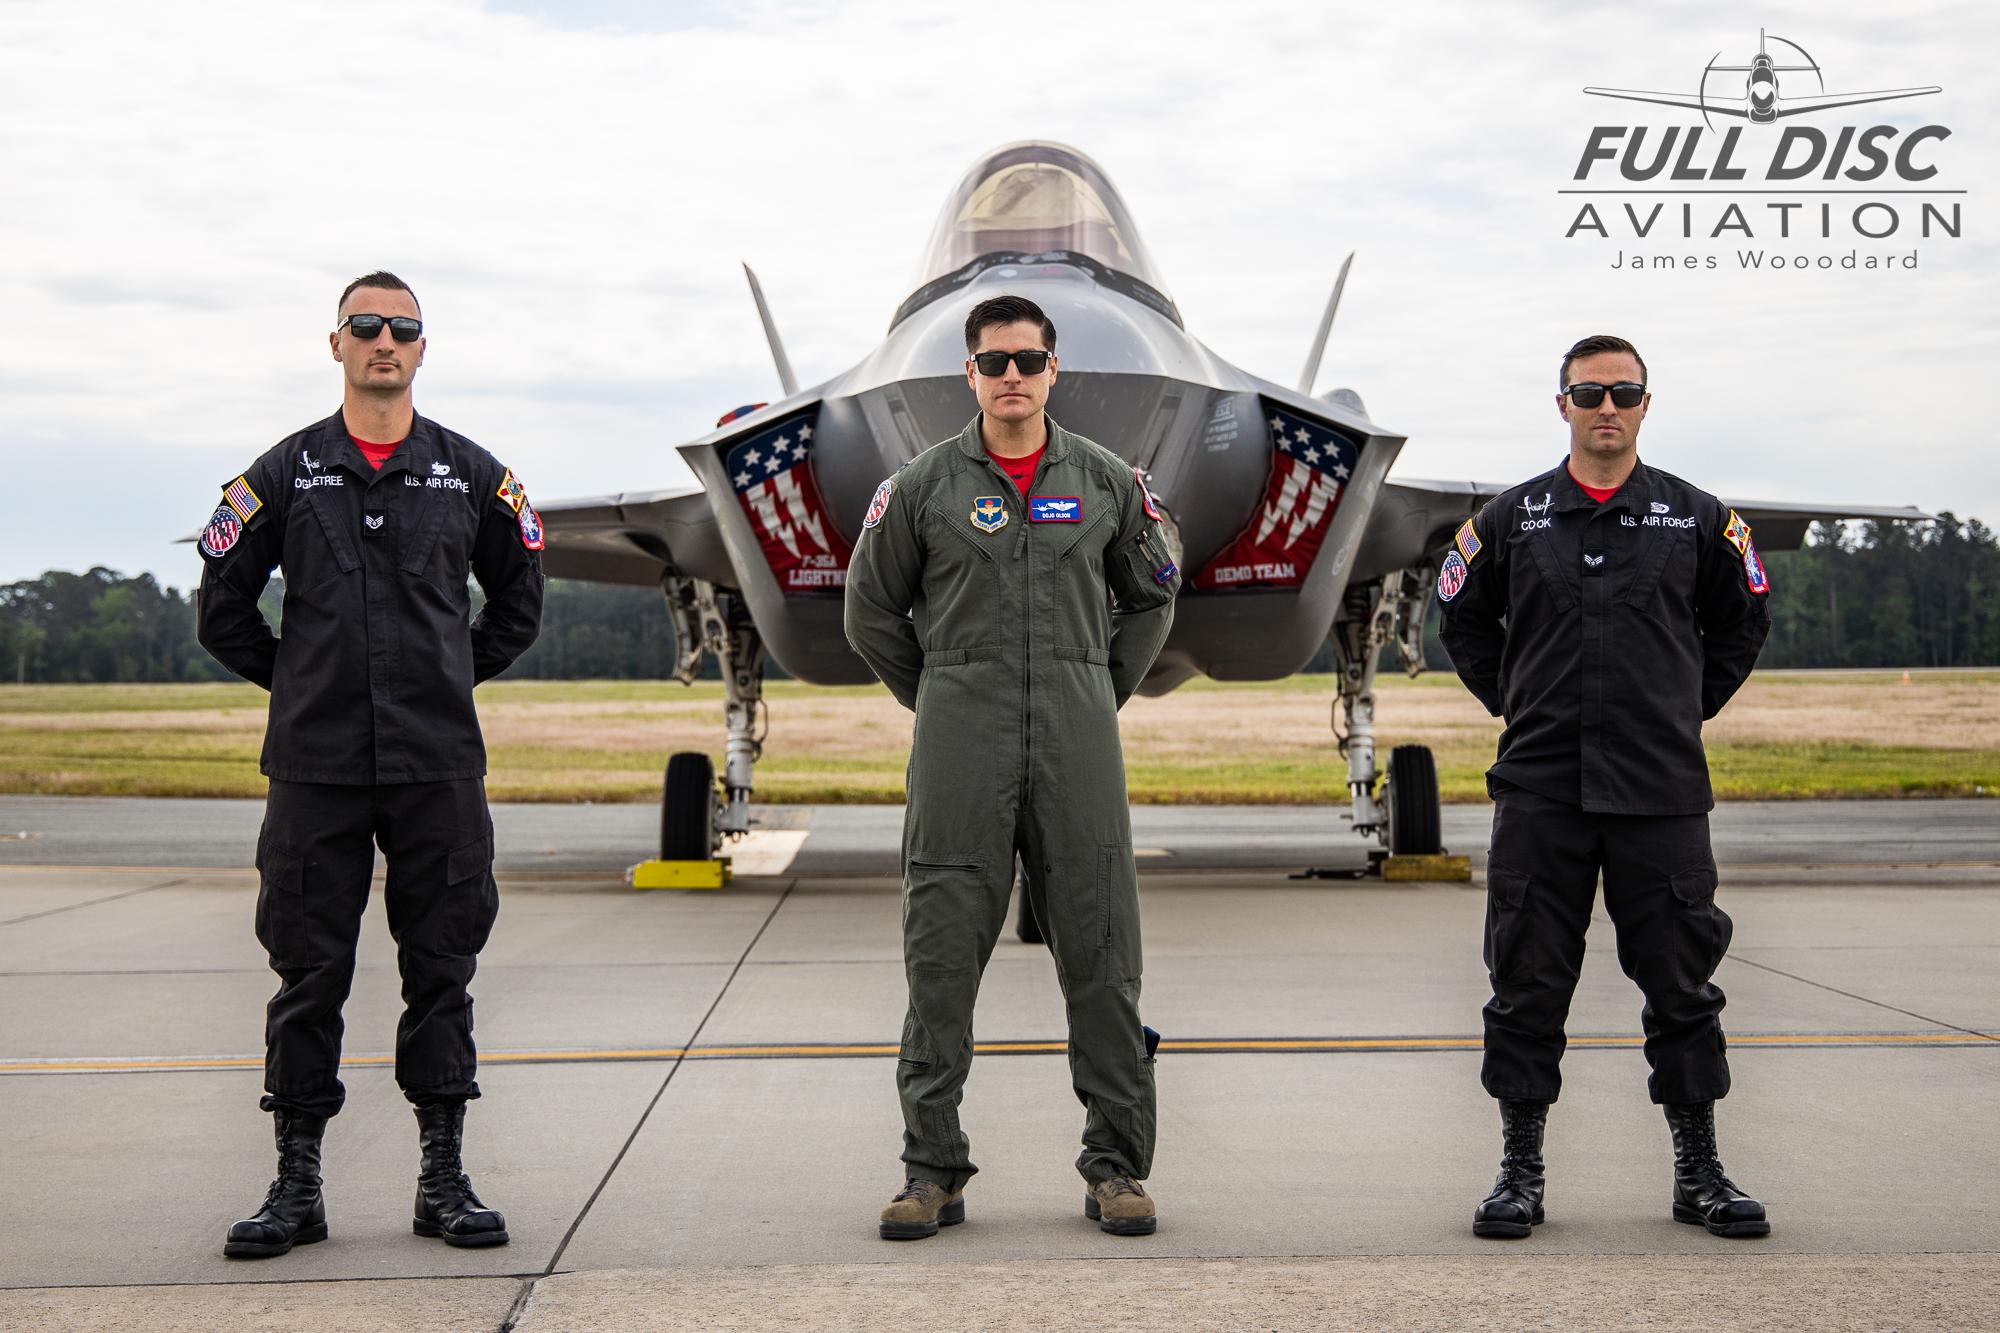 F35DemoTeam_FullDiscAviation_JamesWoodard-April 28, 2019-08.jpg